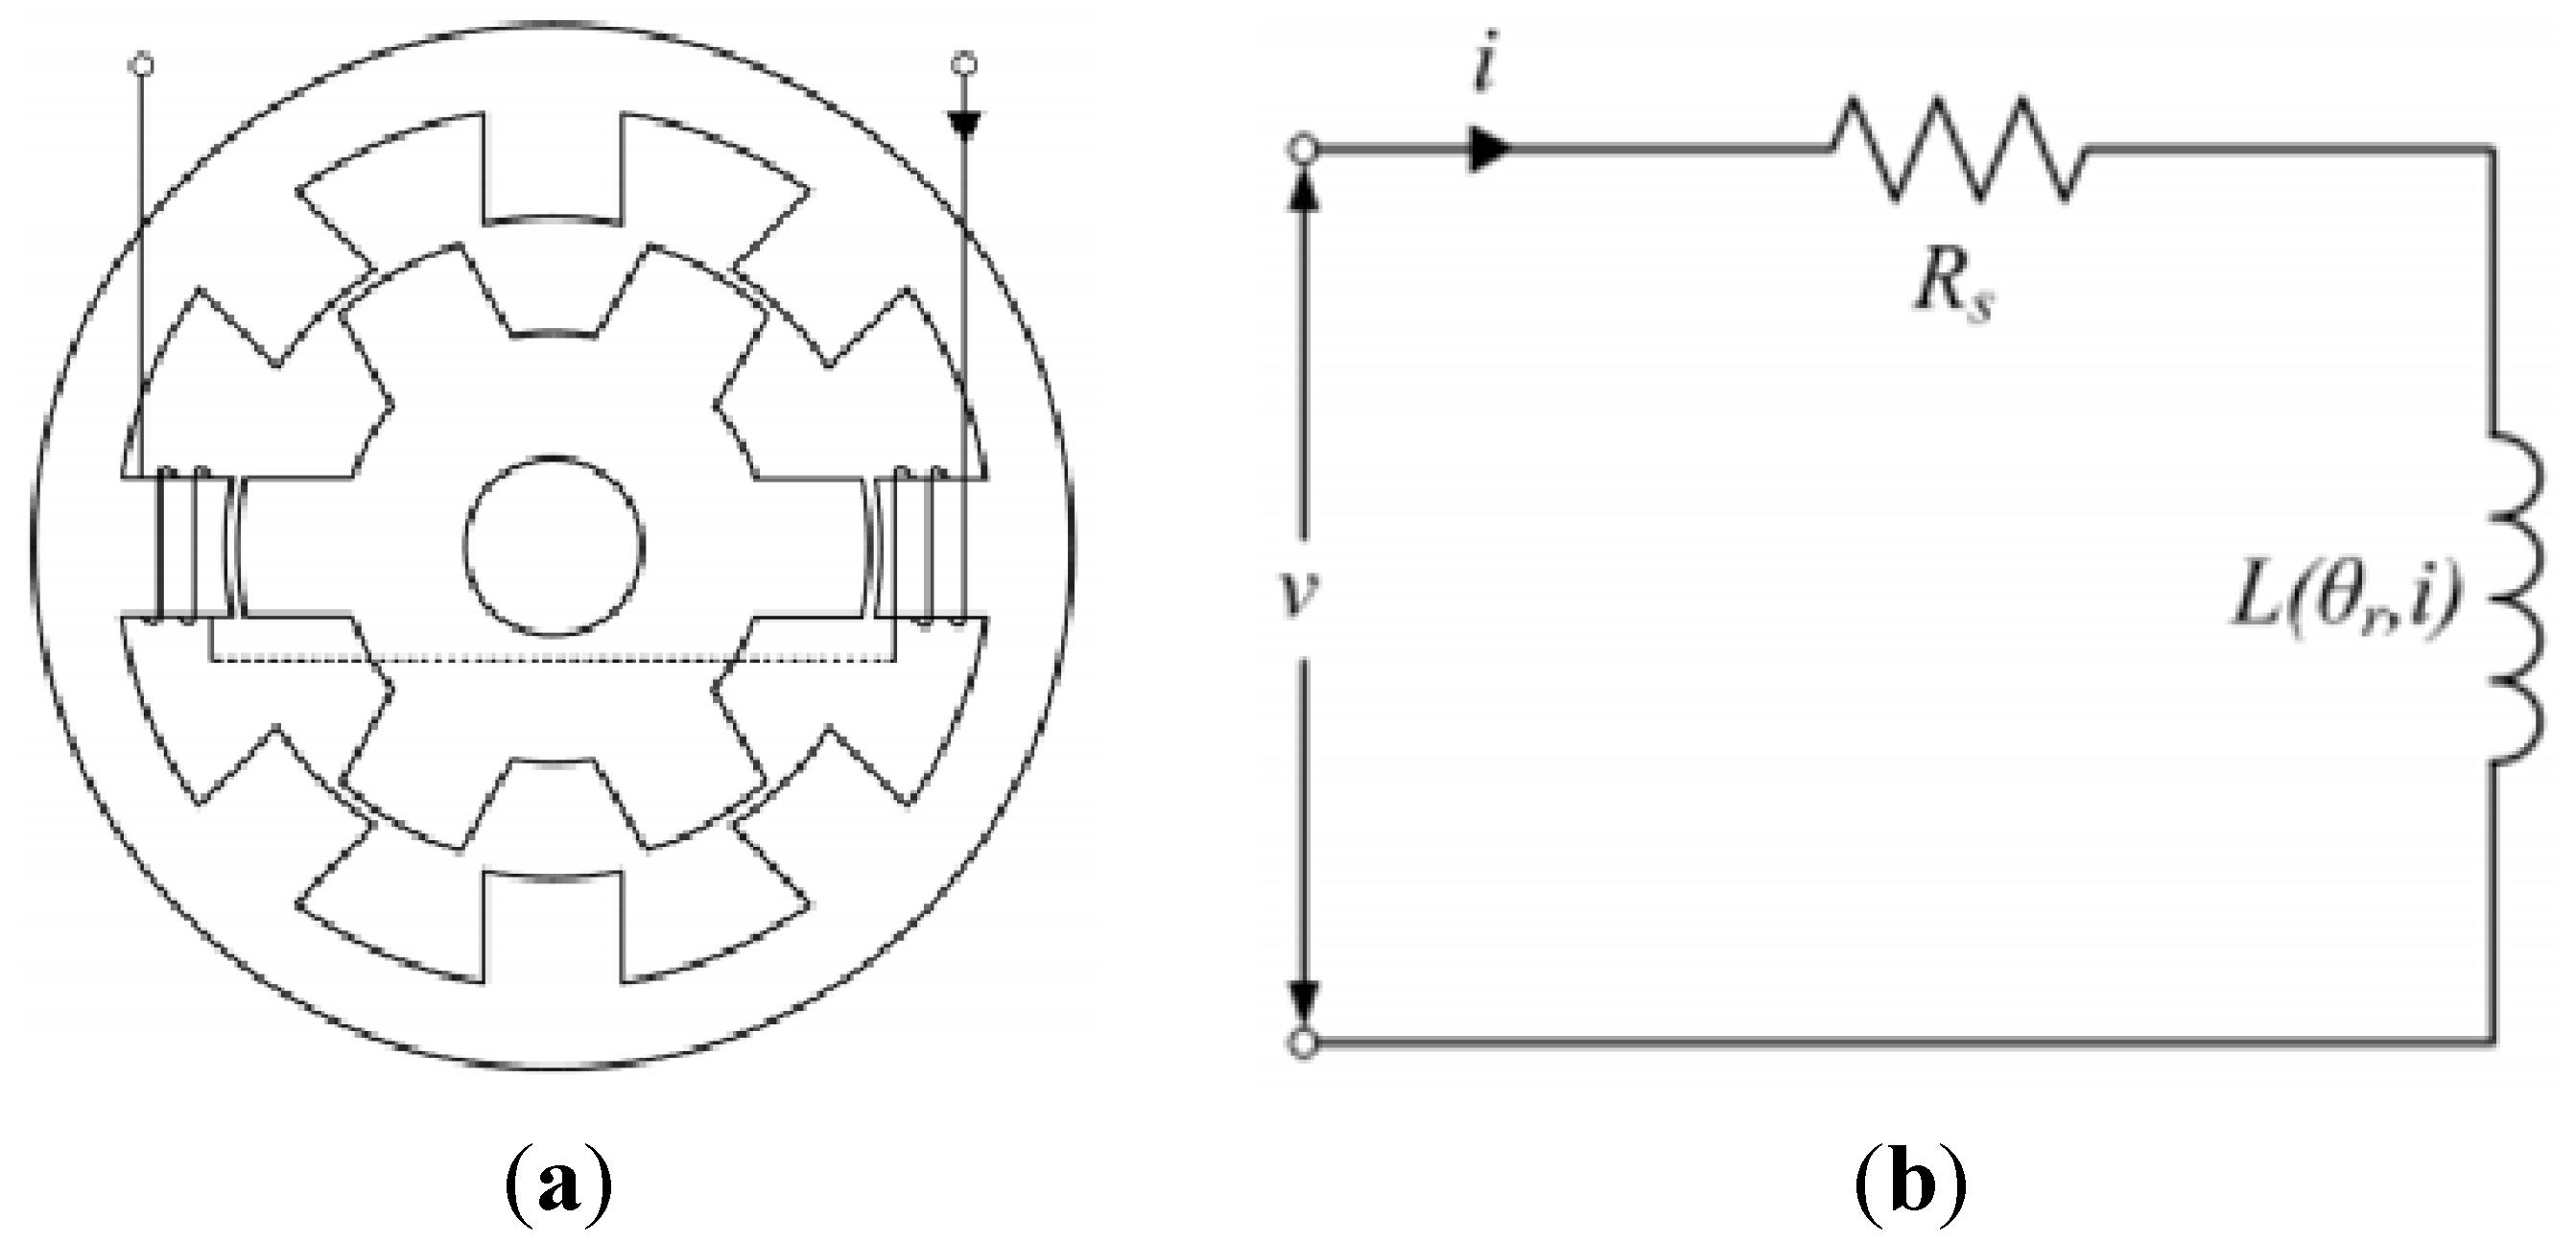 460 Volt Single Phase Motor Wiring Diagrams 240 Volt Motor